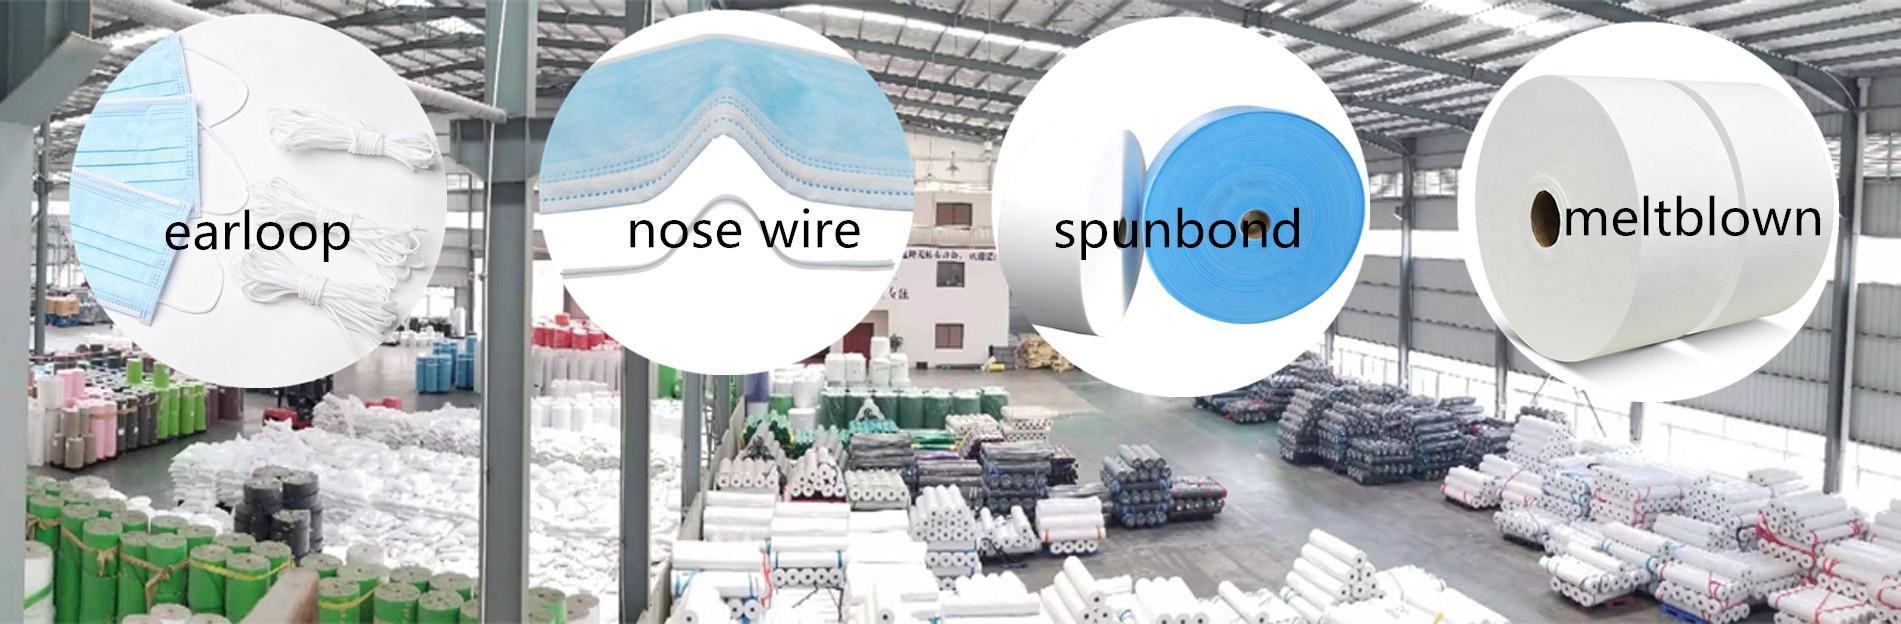 Sunshine nonwoven fabric factory